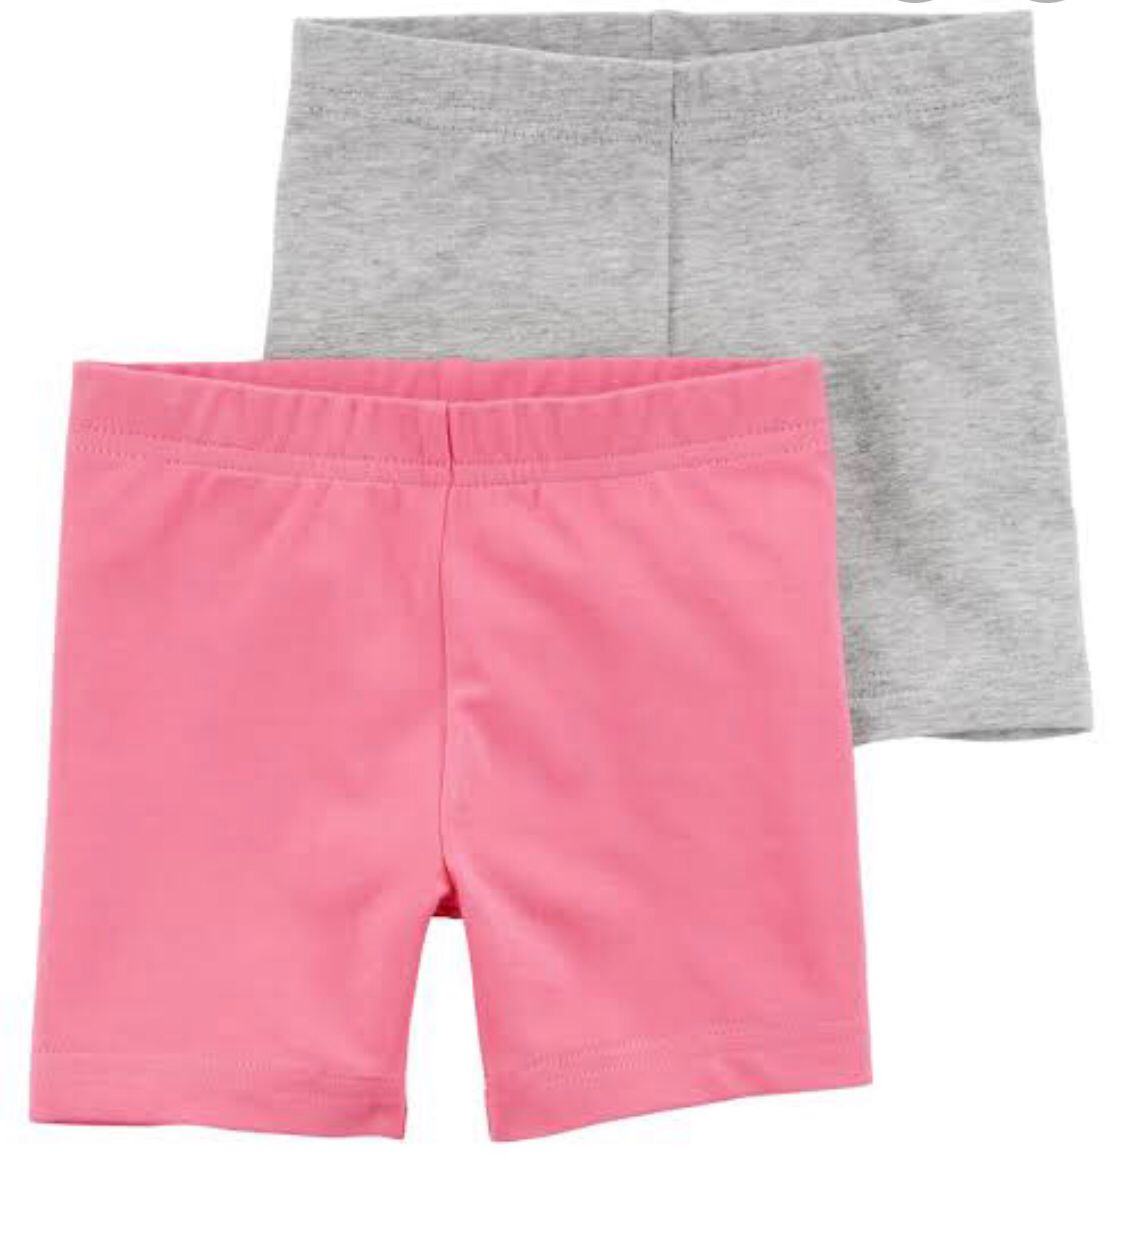 Kit Camiseta Heart + 2 shorts cinza/rosa - Carters